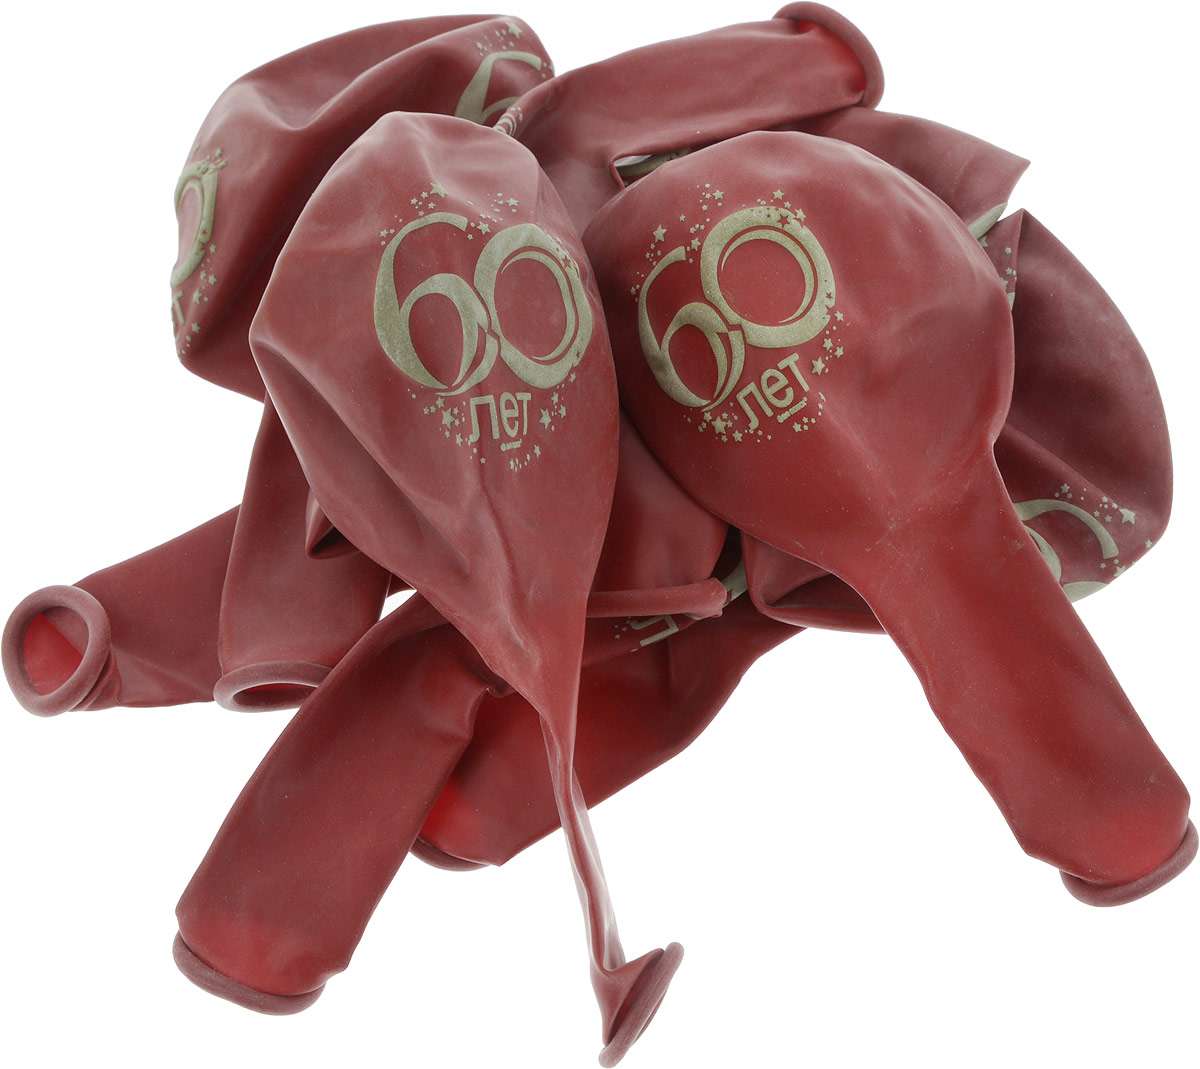 Latex Occidental Набор воздушных шариков Юбилей цифра 60 10 шт latex occidental набор воздушных шариков металлик цвет gold 025 100 шт